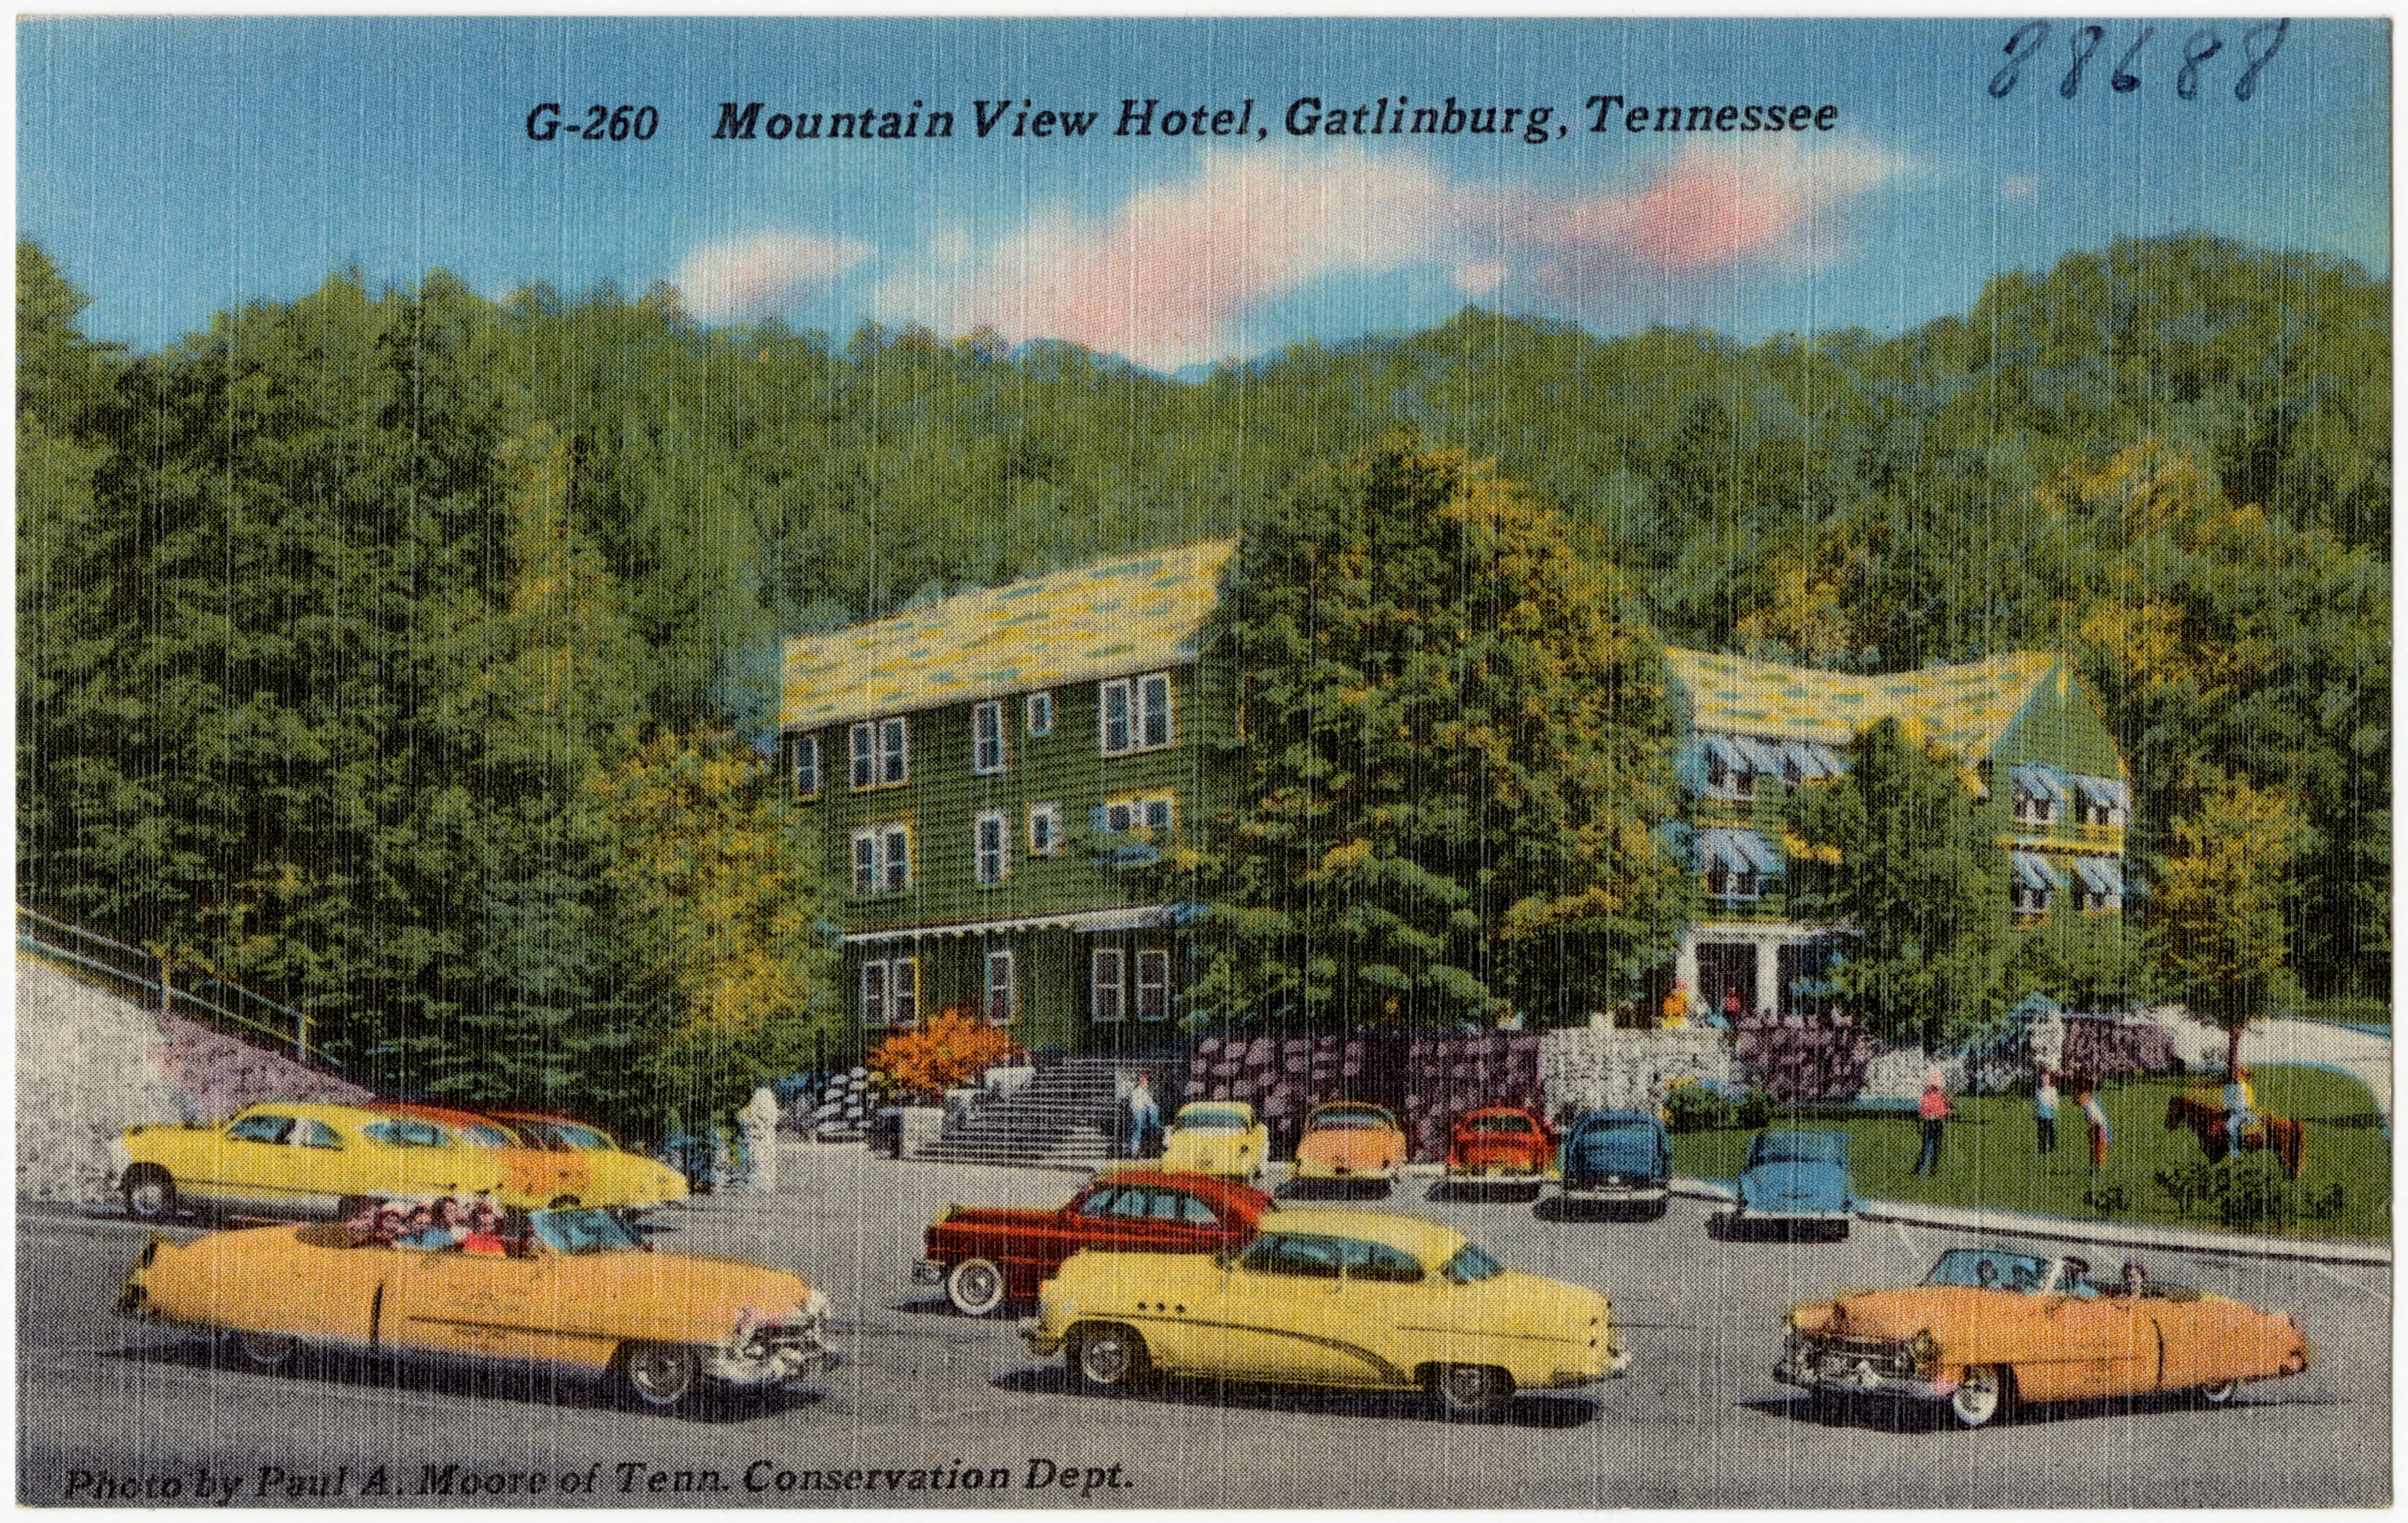 Oval Tablecloth Size Chart: Mountain View Hotel Gatlinburg Tenn (88688).jpg - Wikimedia ,Chart